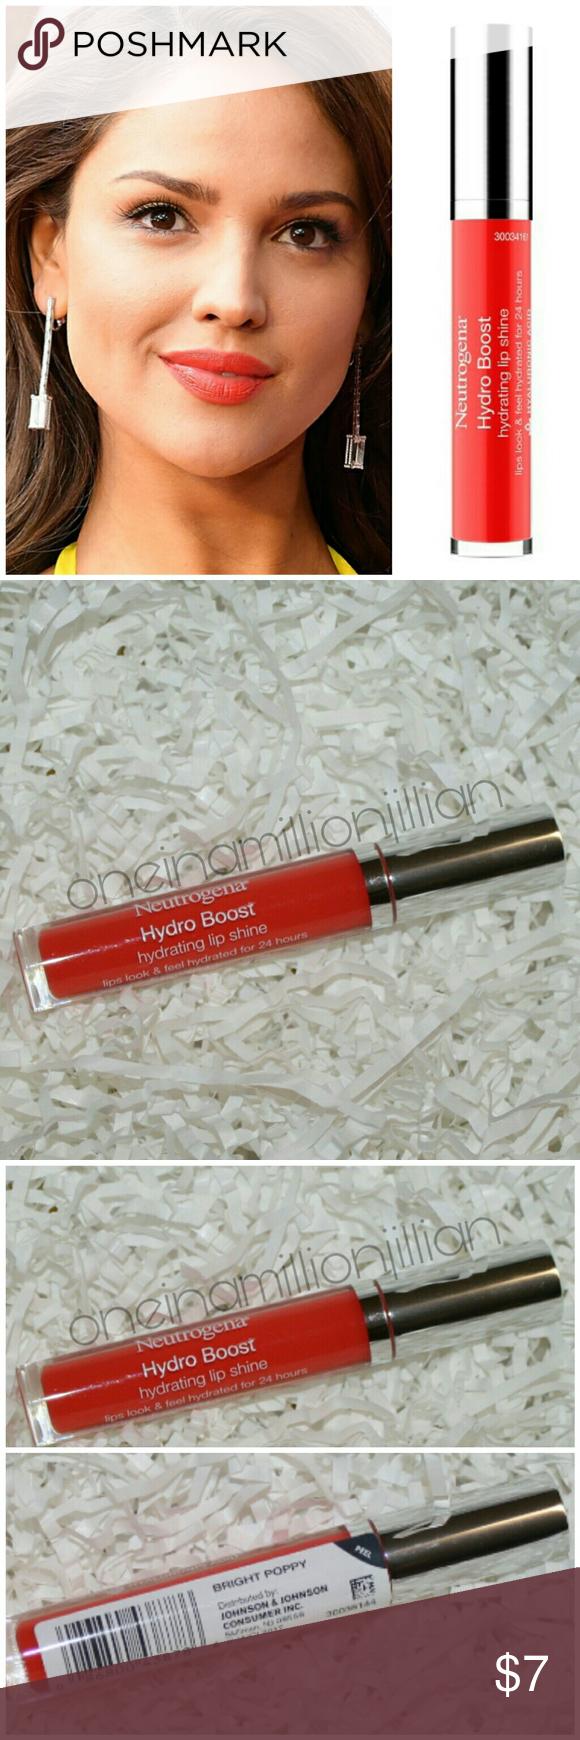 Neutrogena Hydro Boost Lip Gloss Boutique Neutrogena